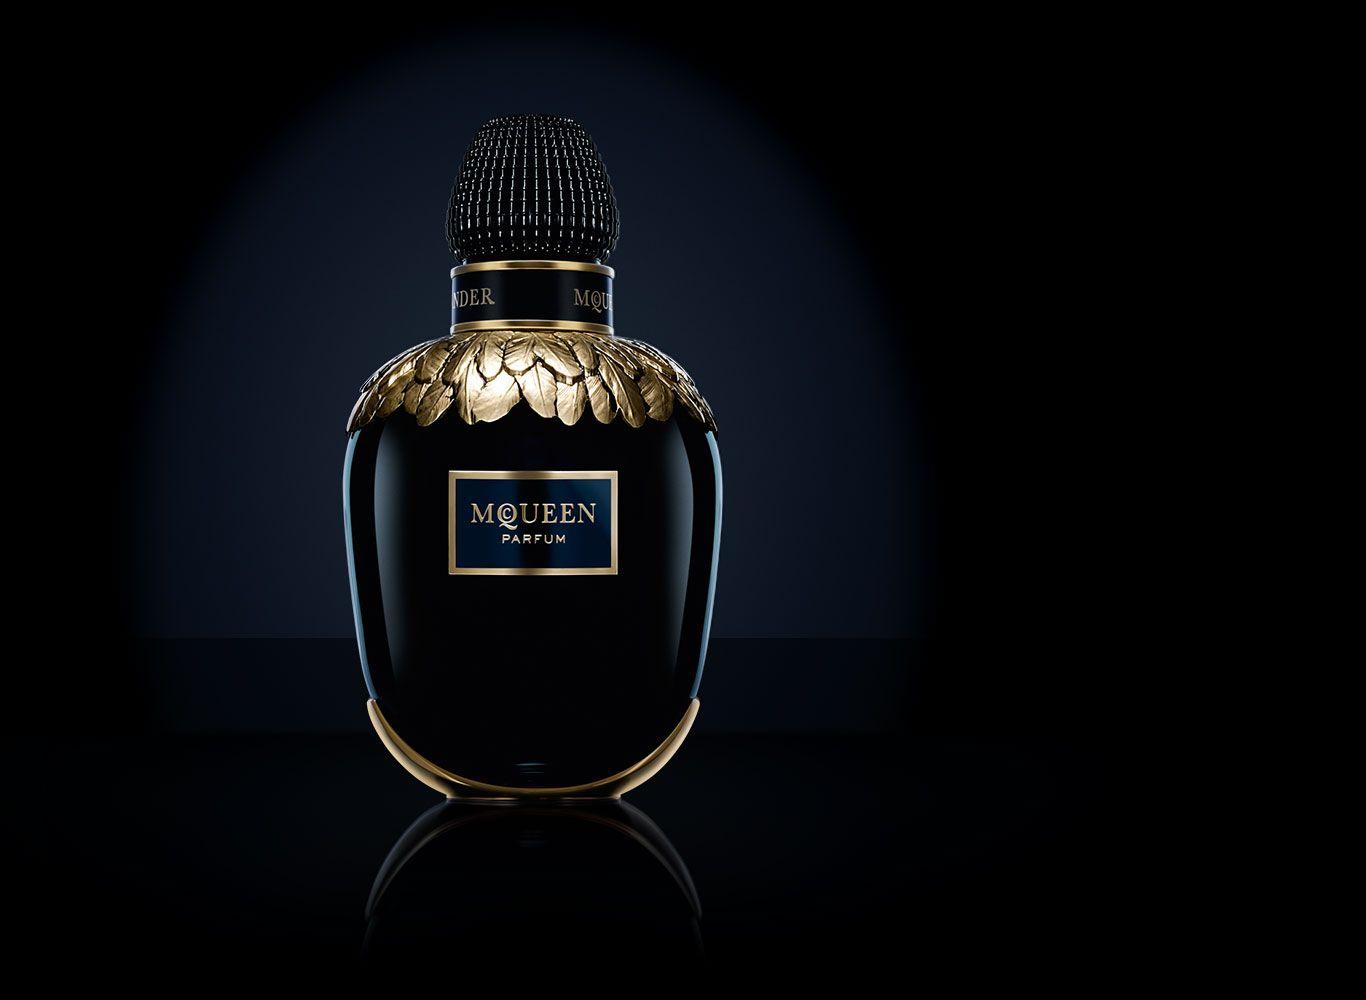 Alexander McQueen Launches A Fragrance House Alexander McQueen Launches A Fragrance House new pictures